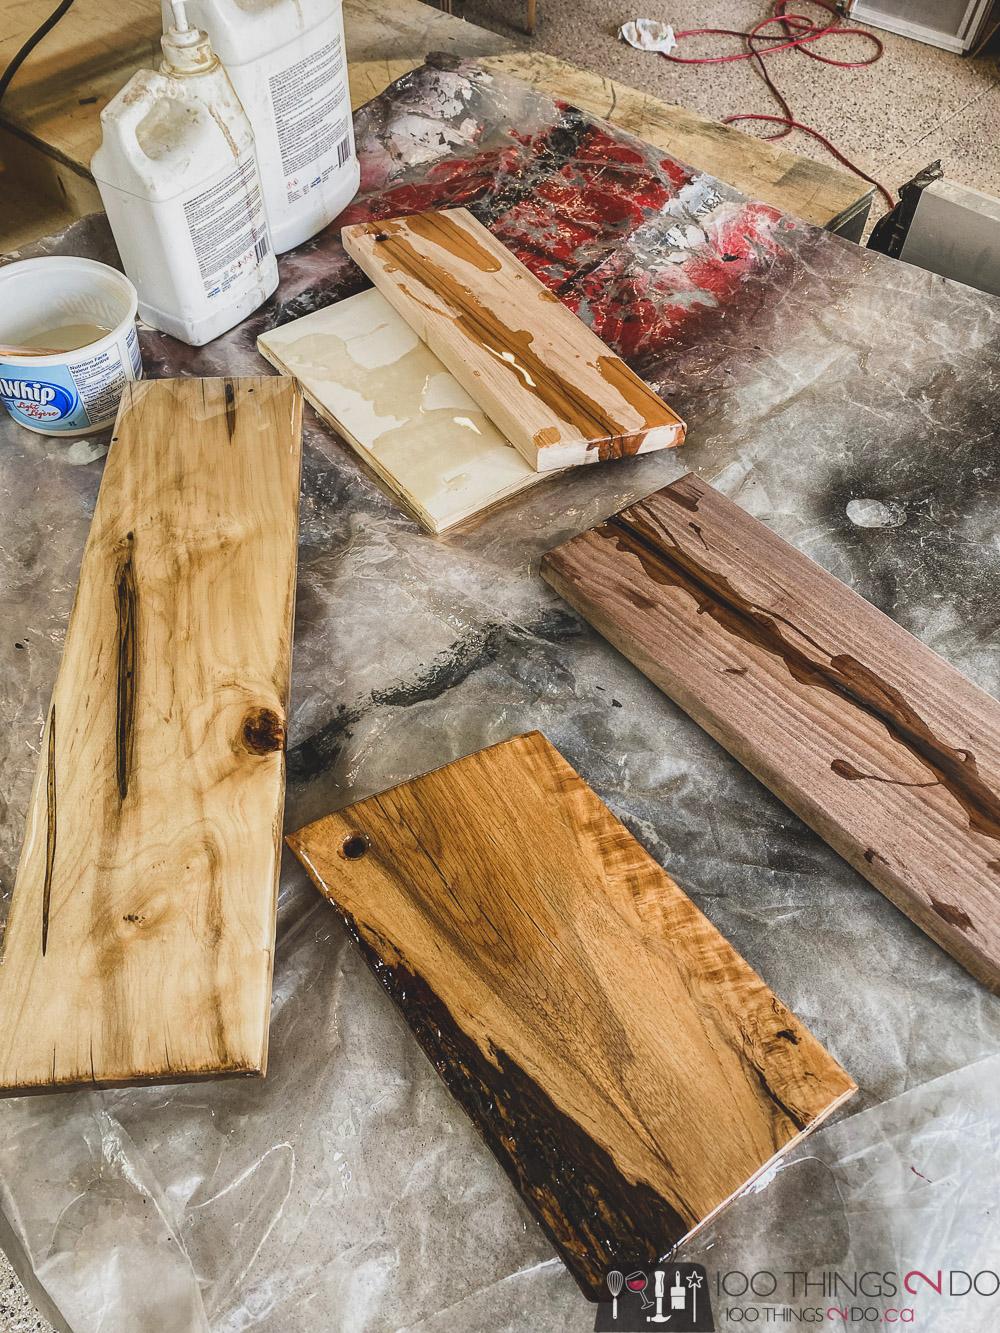 epoxy coated charcuterie boards, epoxied charcuterie boards